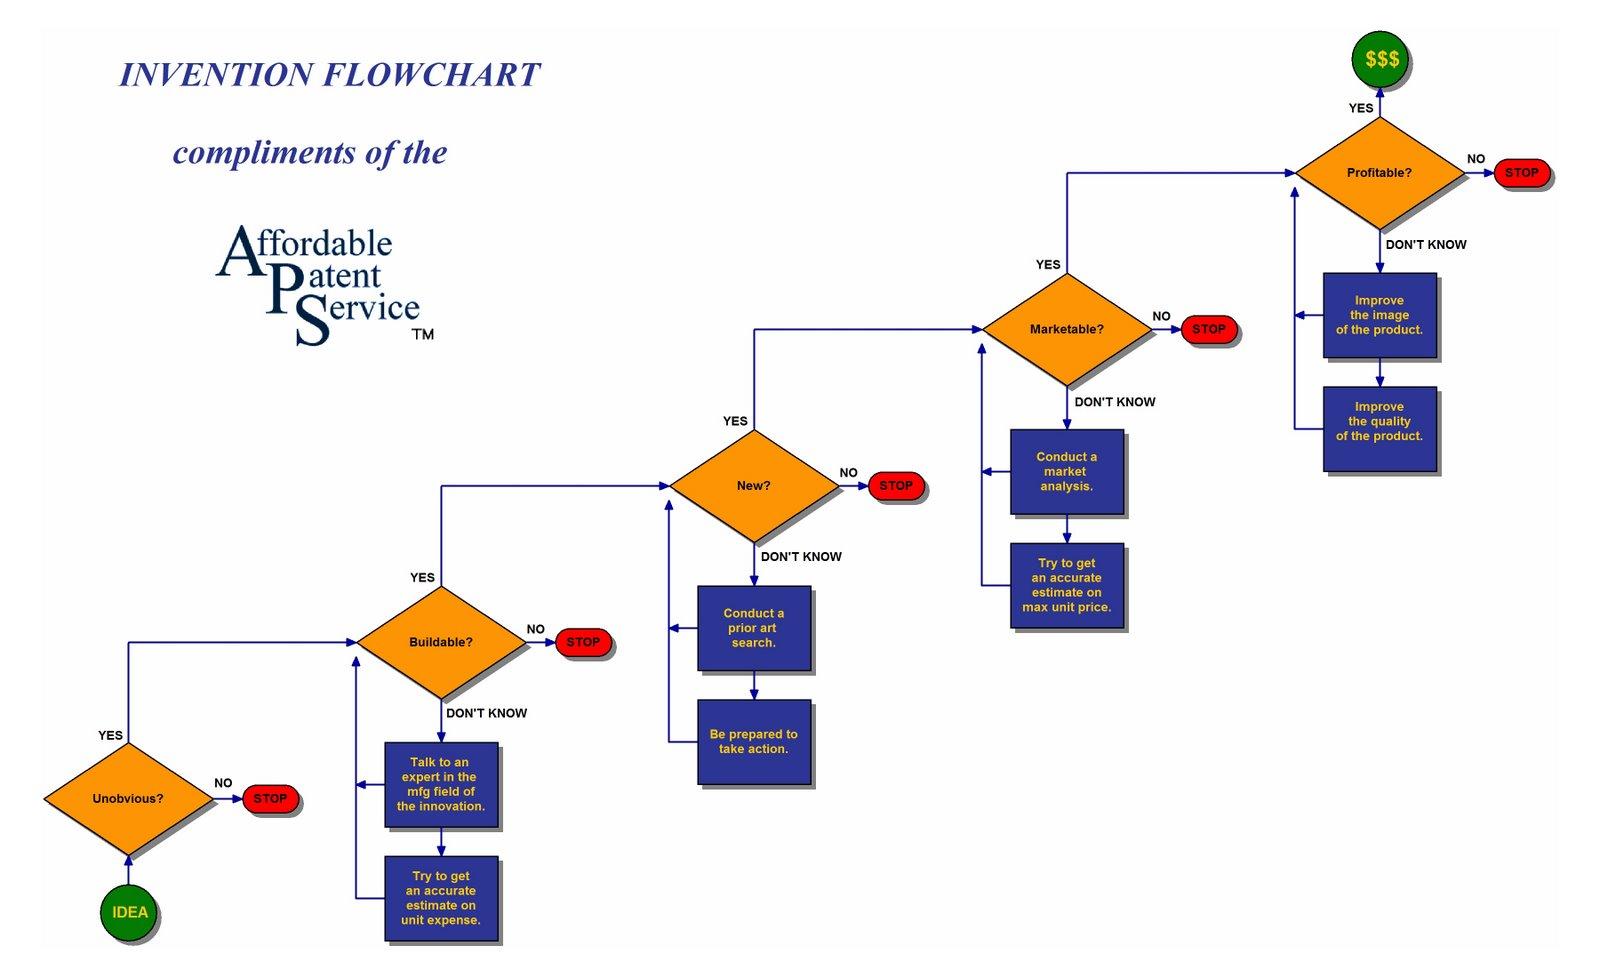 flowchart image